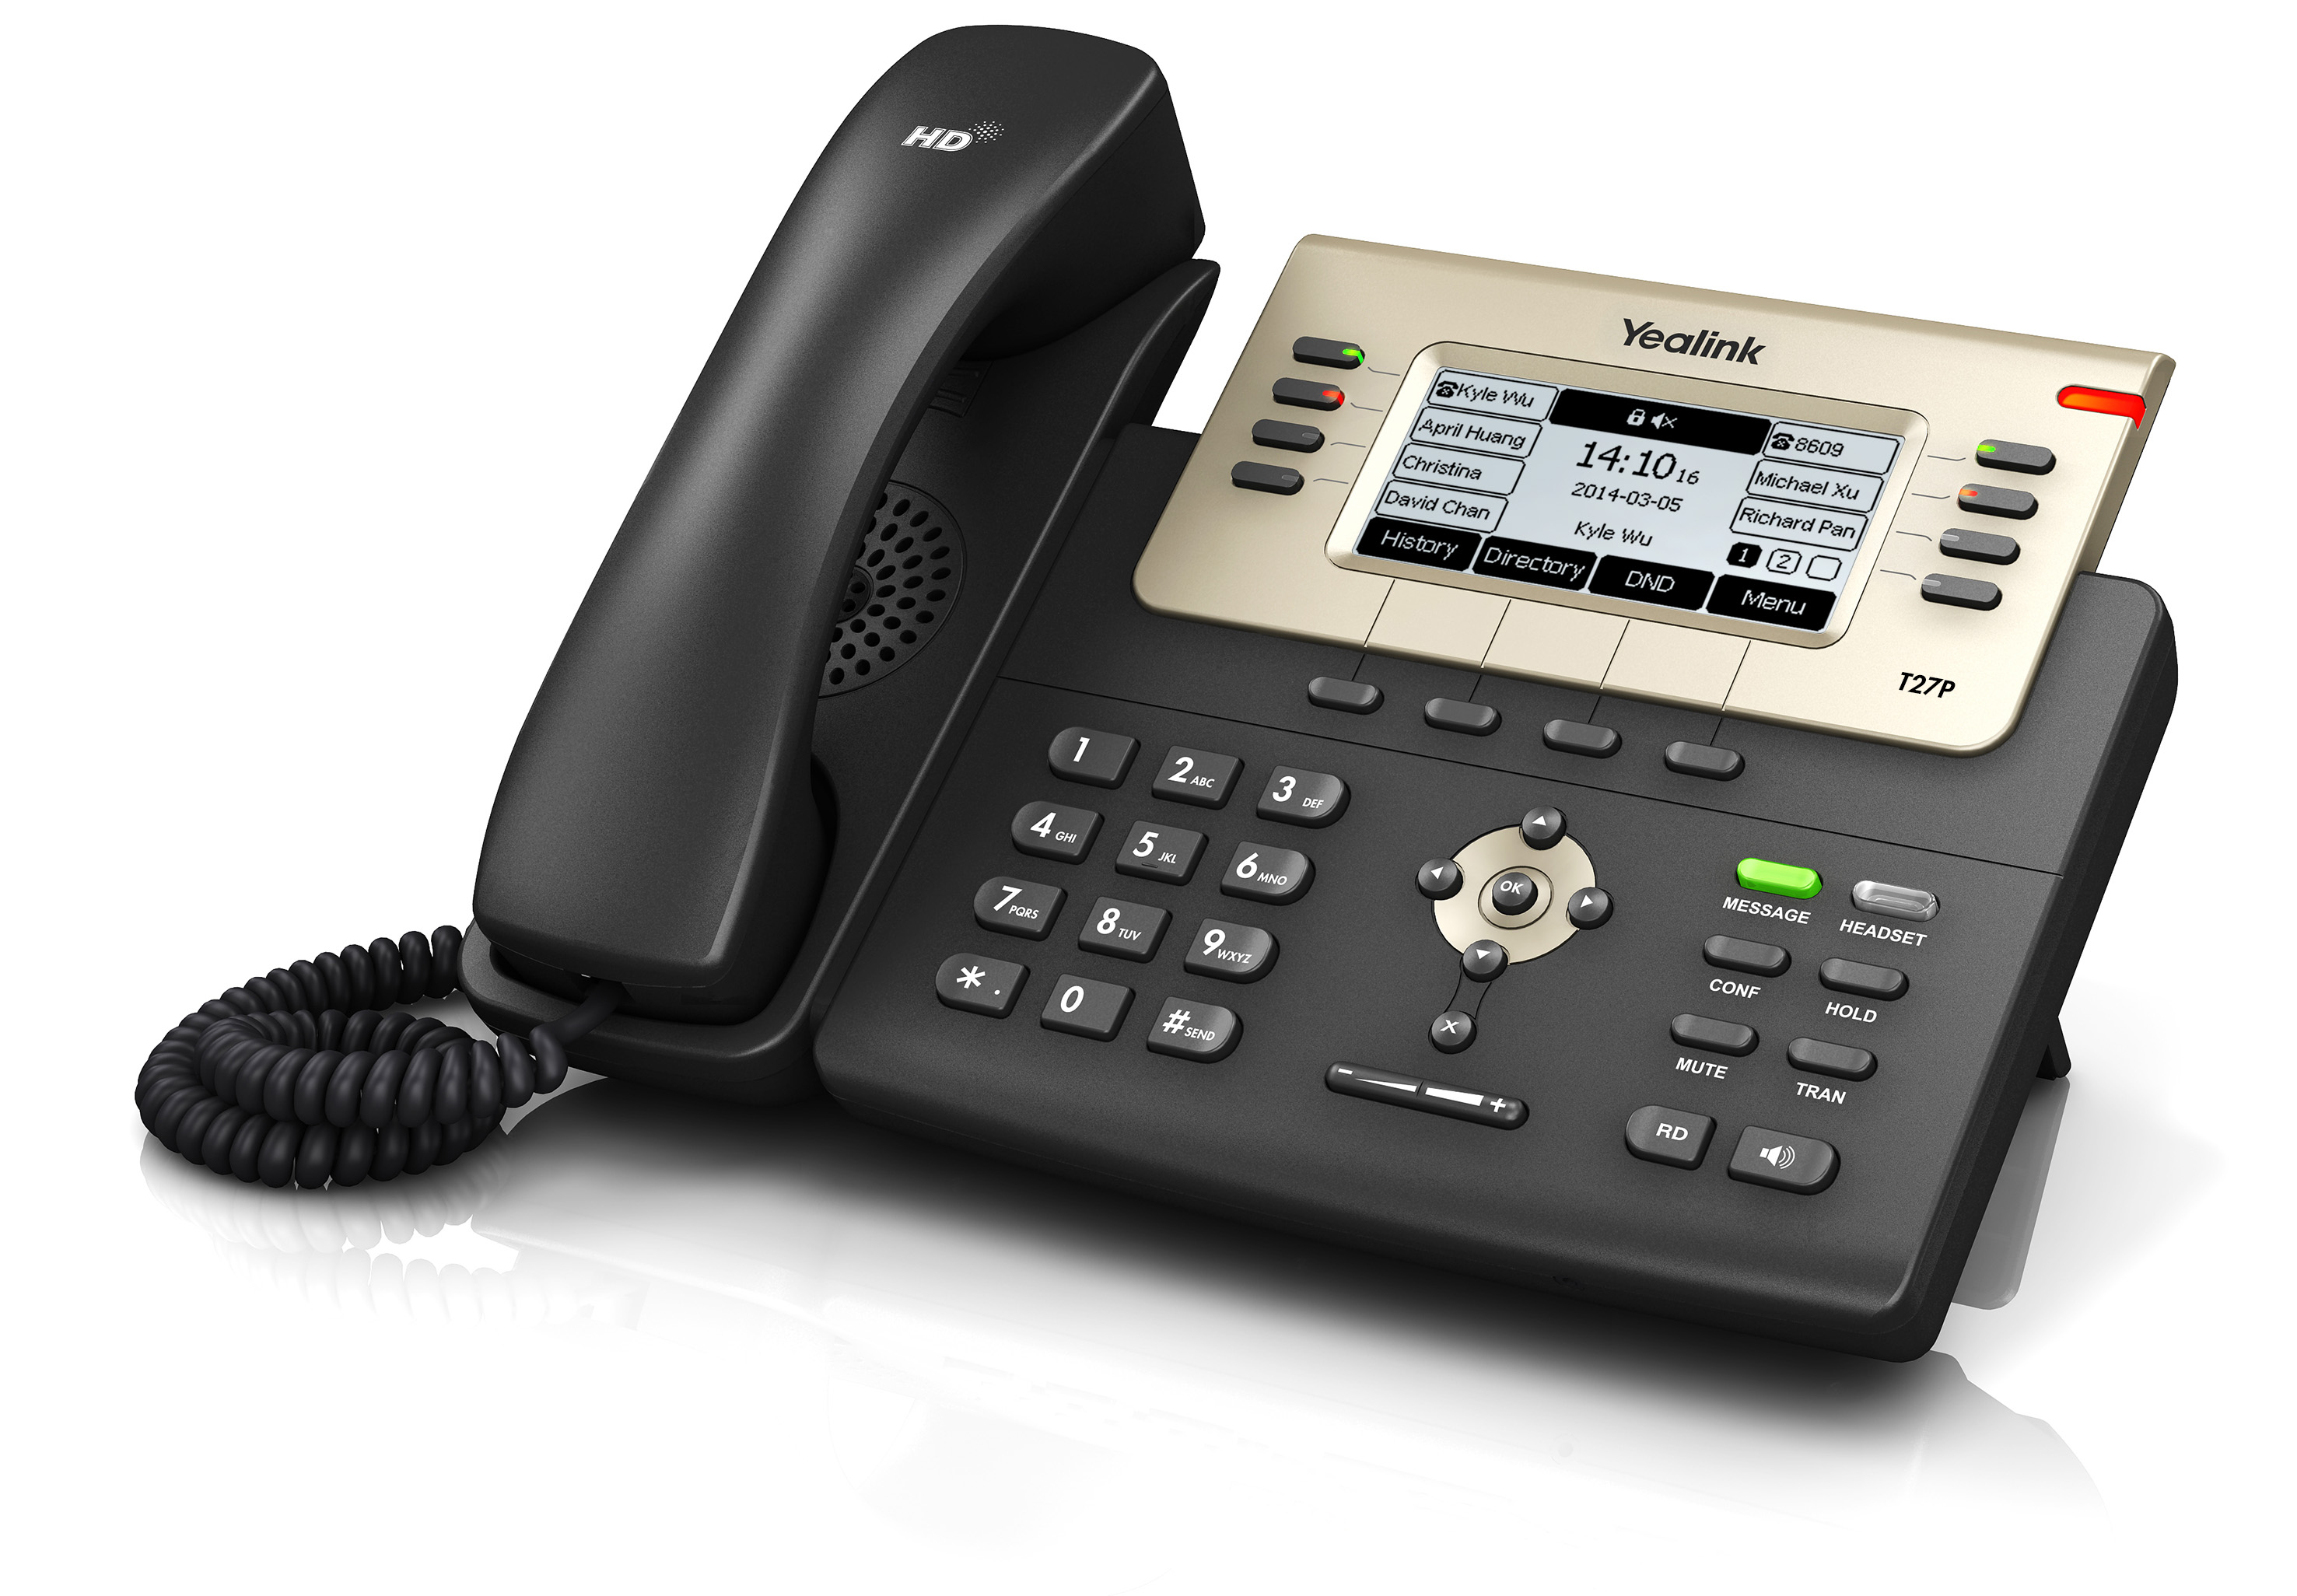 "Yealink SIP-T27P IP tel., PoE, 3,7"" 240x120 LCD, 21 prog.tl."